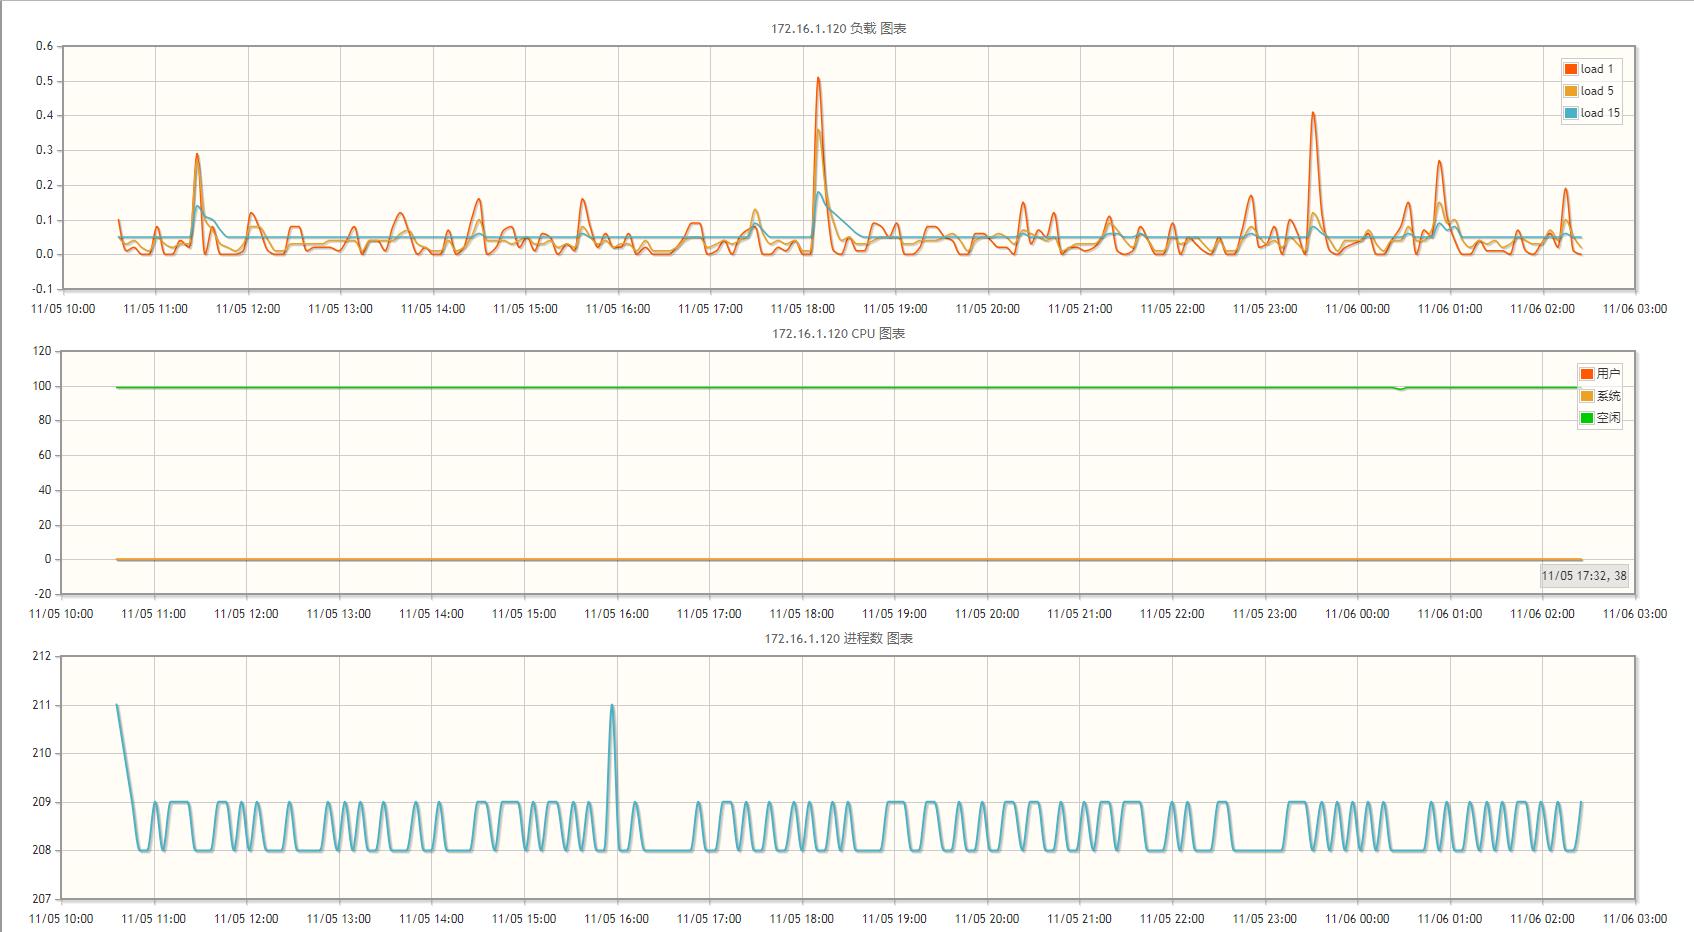 Lepus搭建企业级数据库全方位监控系统